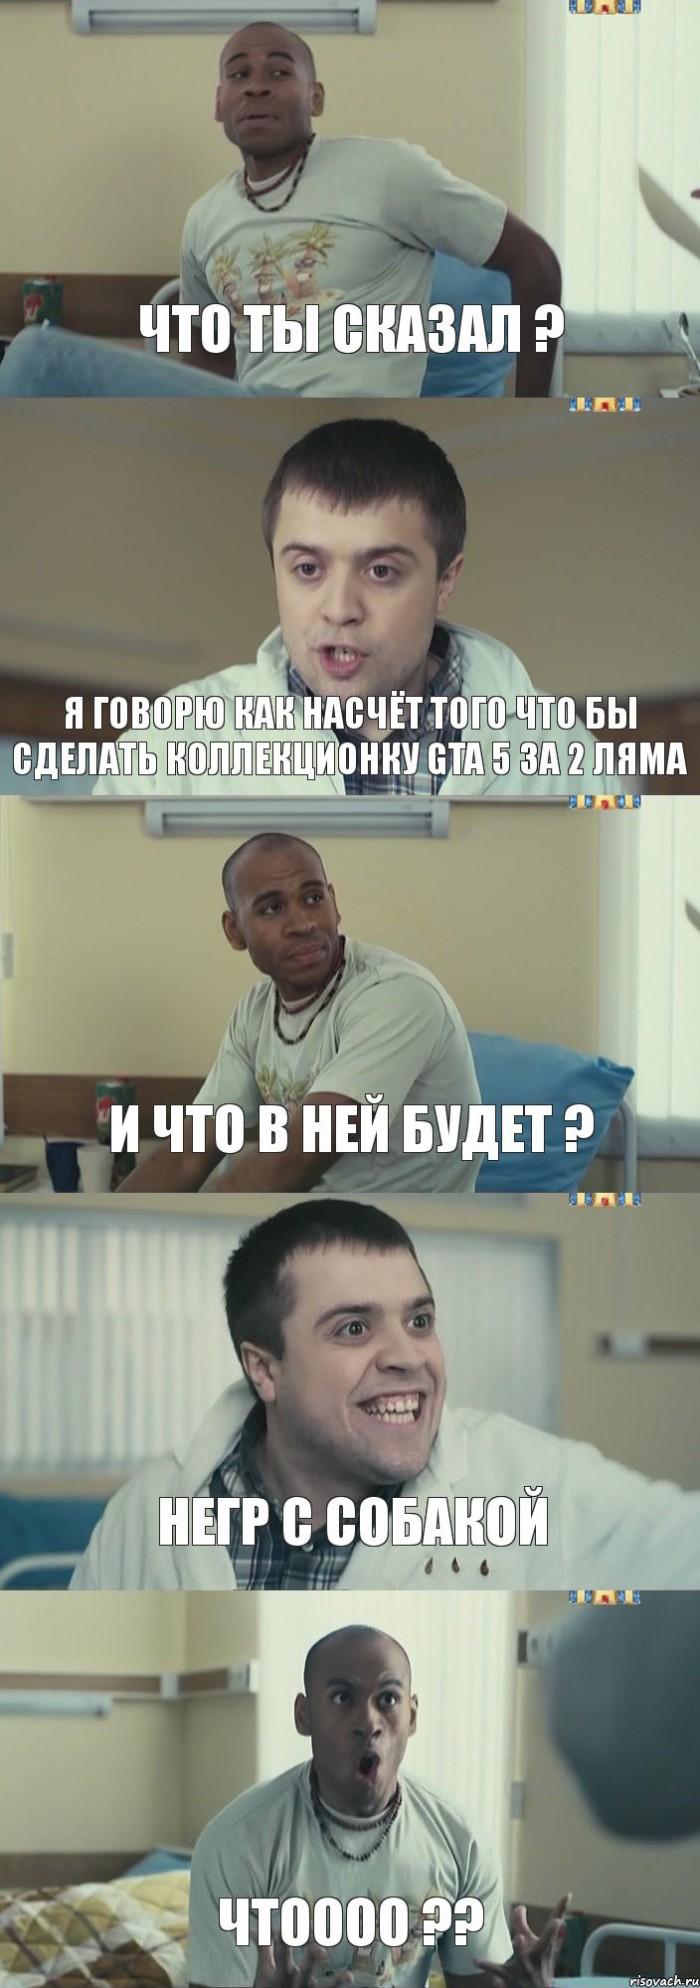 russkoe-porno-rabota-rukami-prekratilas-kriknul